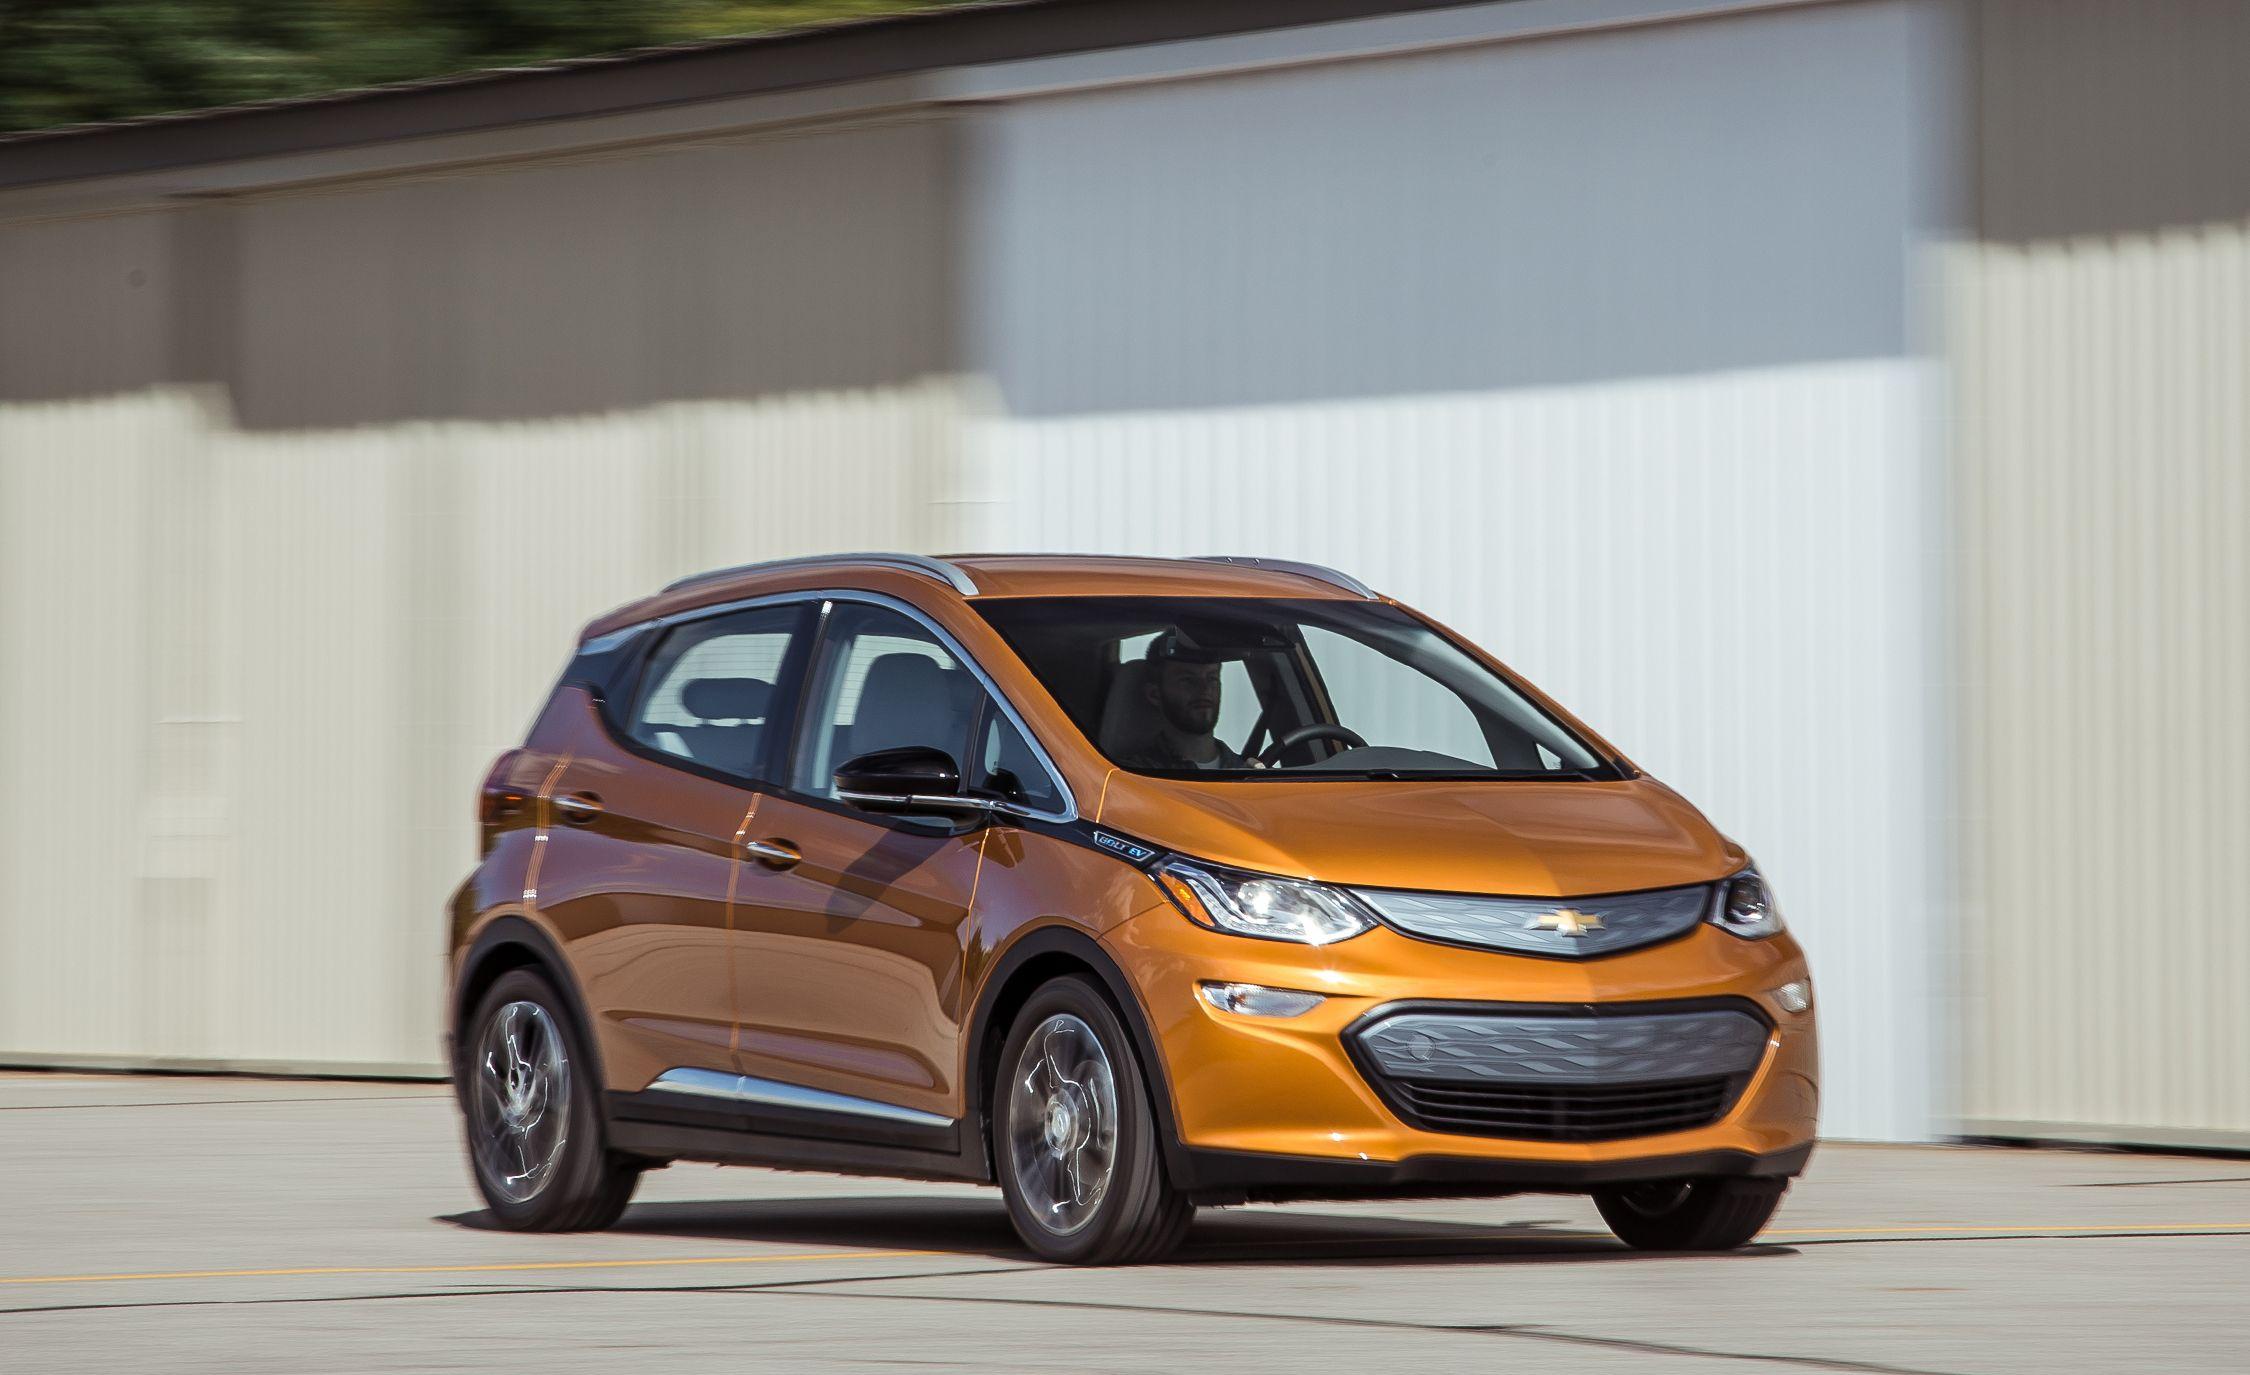 2017 Chevrolet Bolt Prototype Drive Review